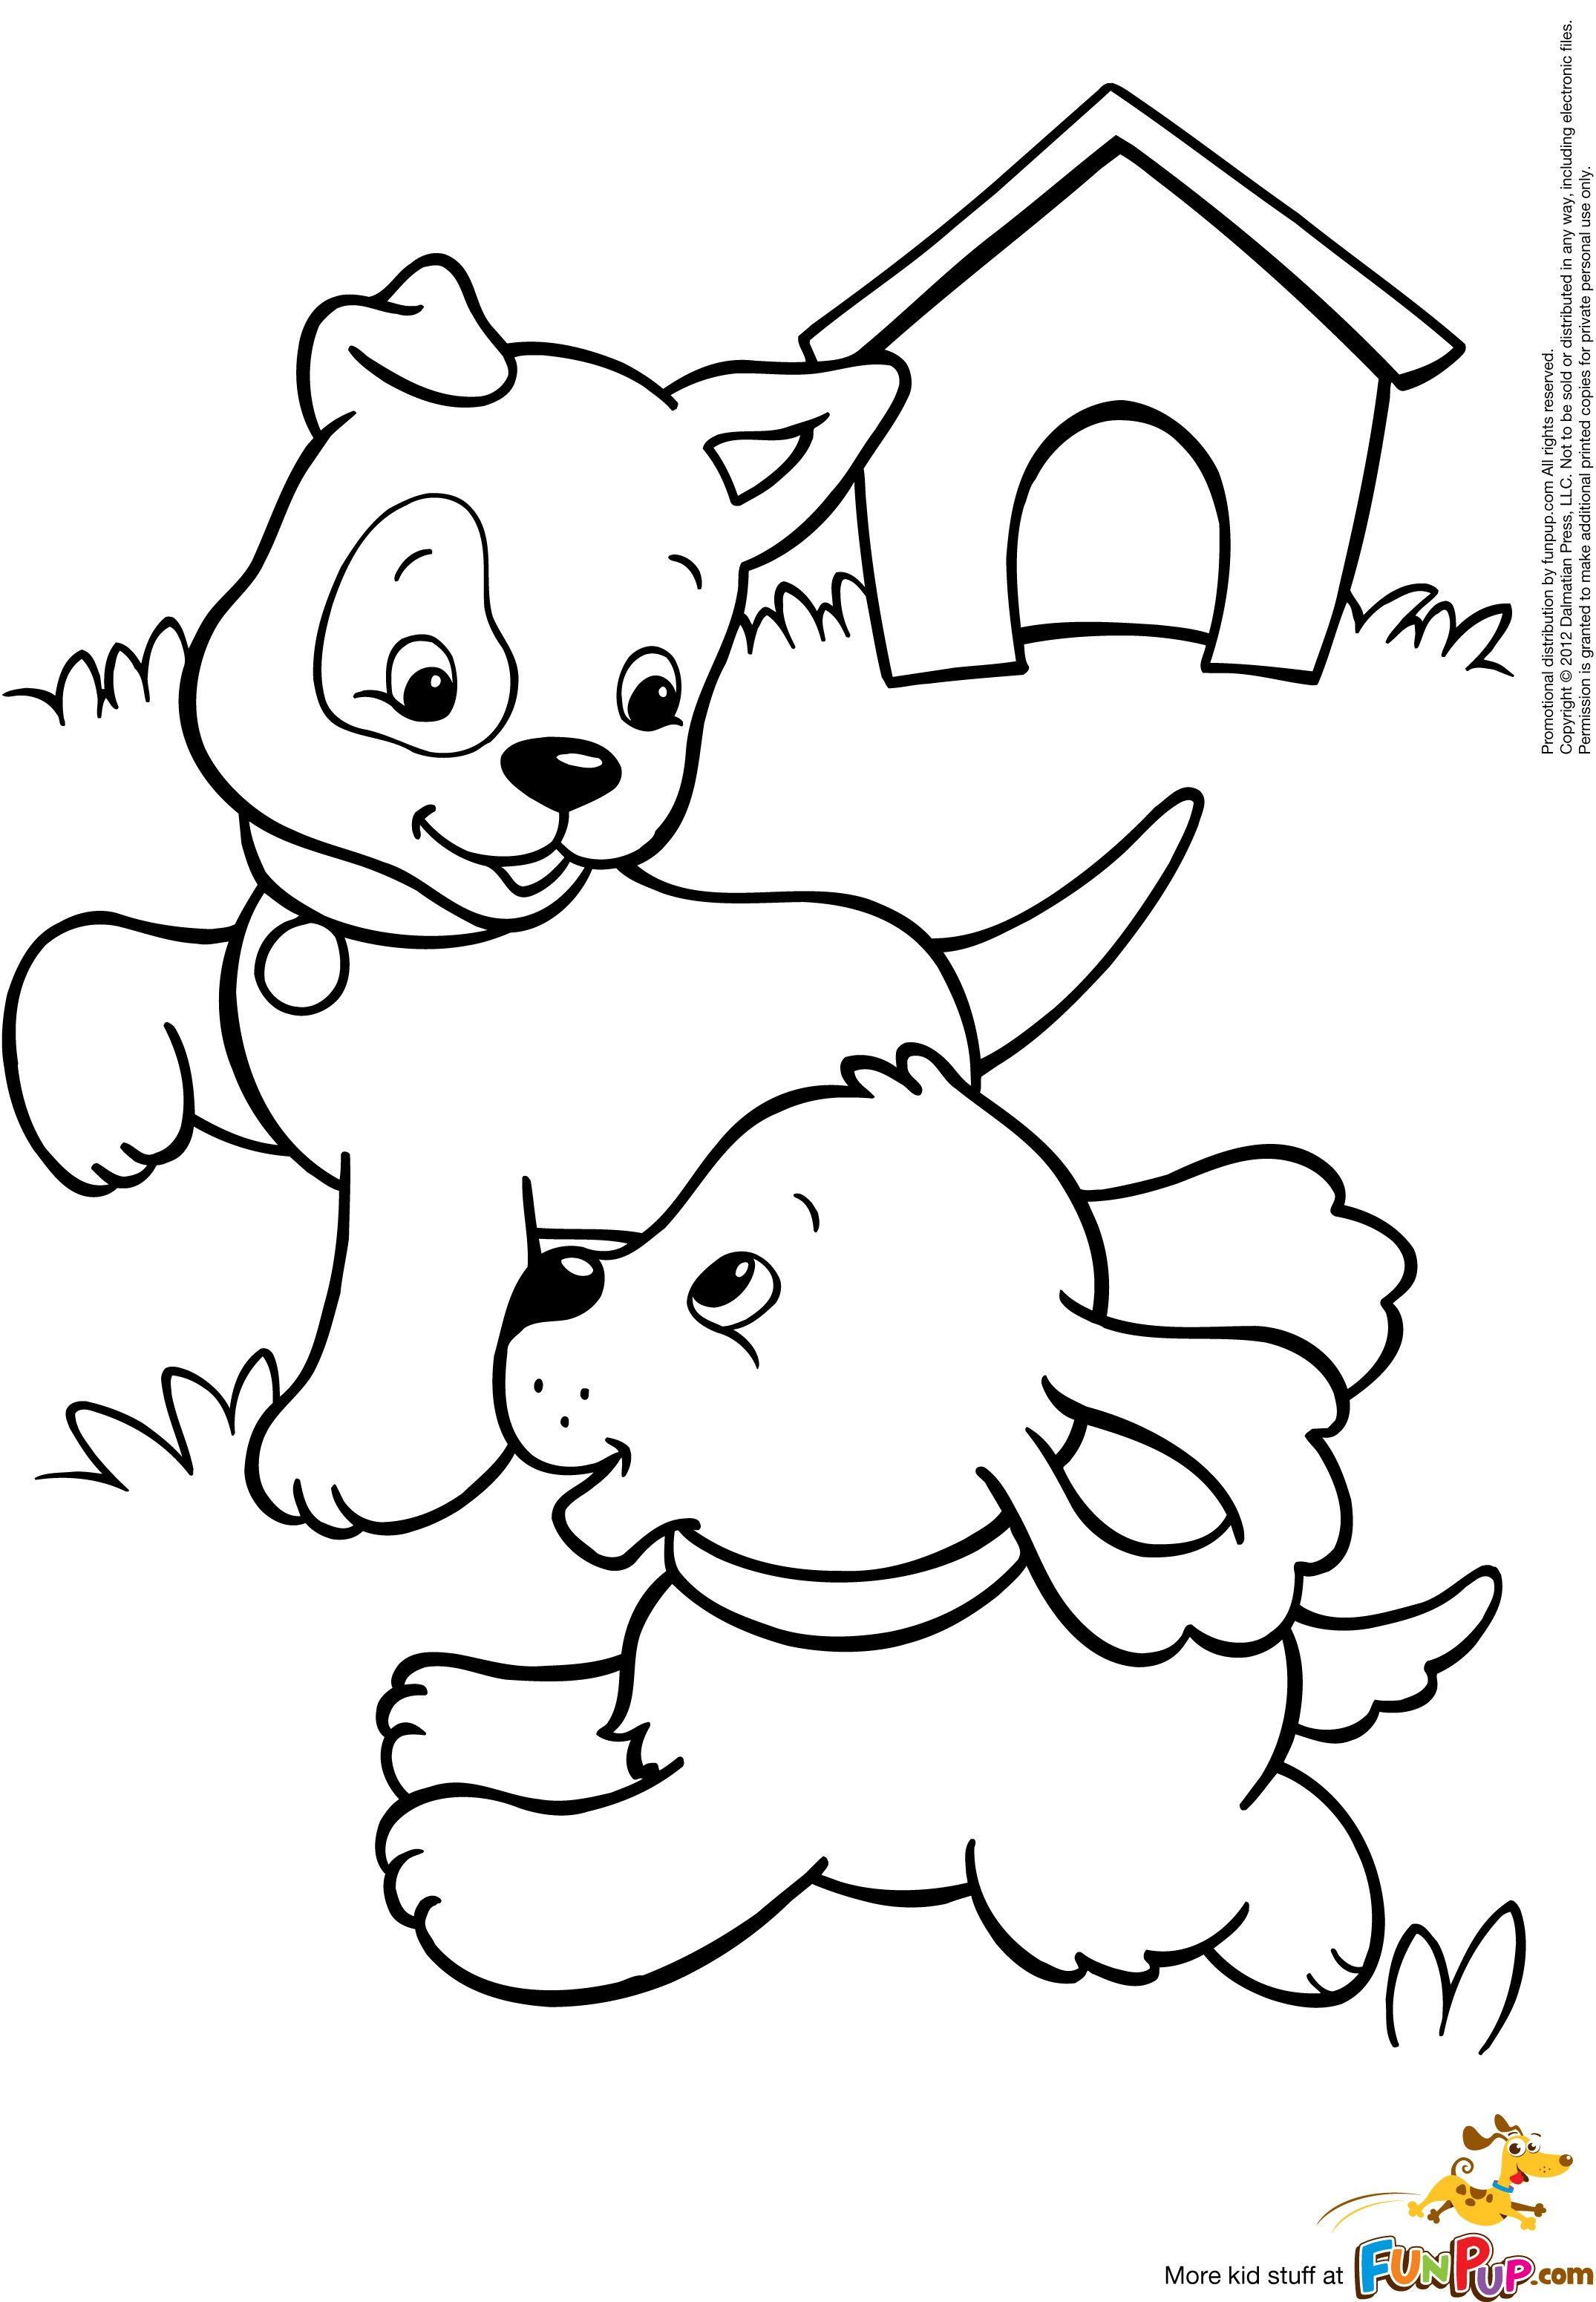 Funpup Puppy 11